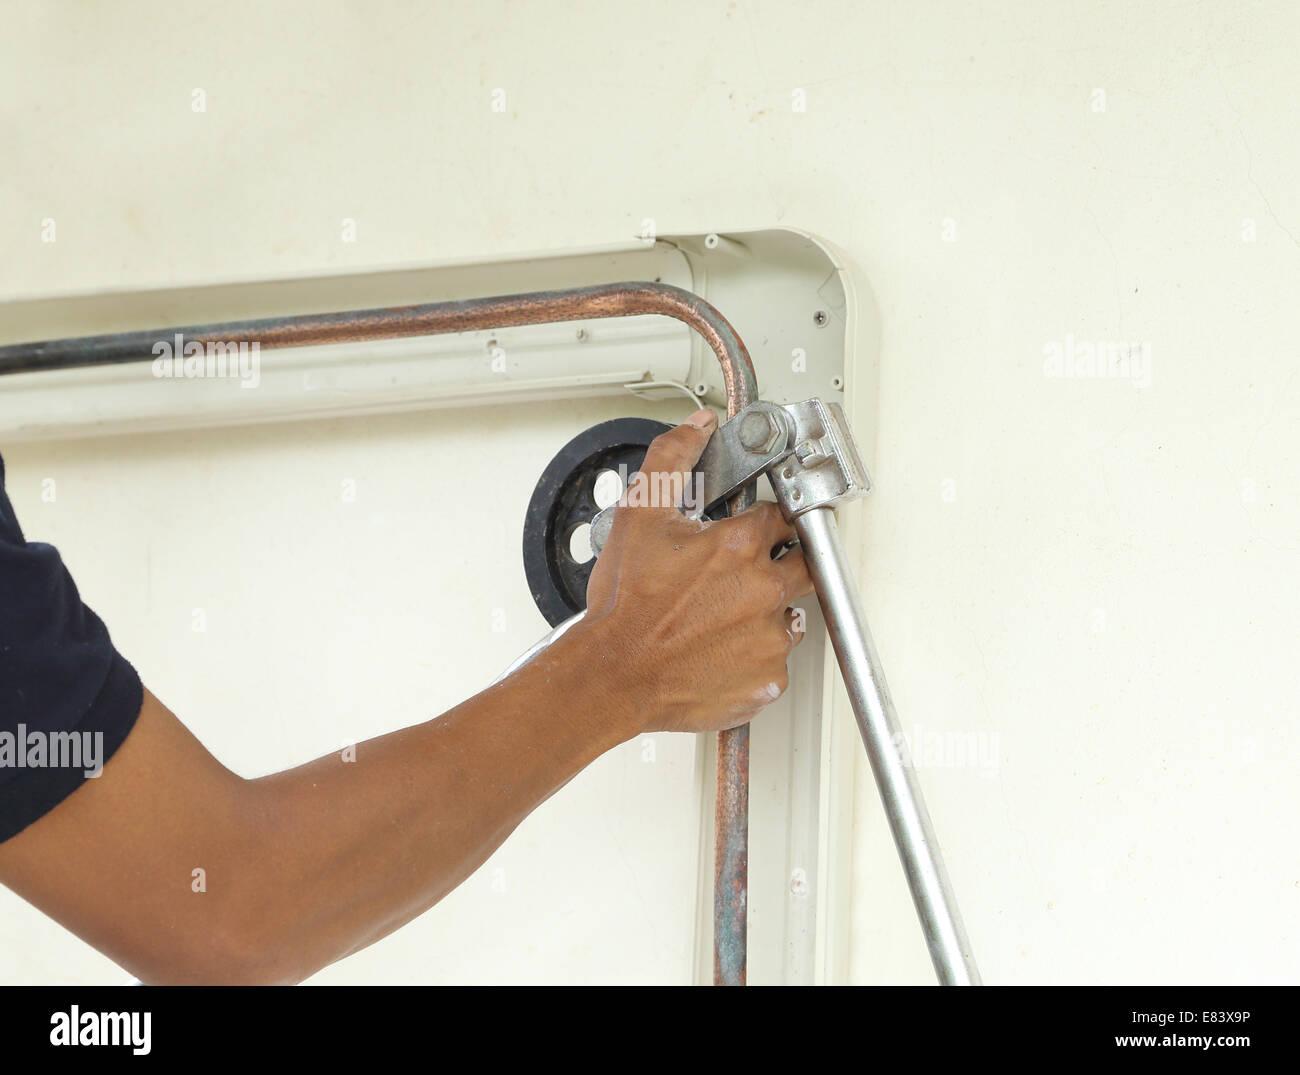 Favorit Copper Piping Stockfotos & Copper Piping Bilder - Seite 3 - Alamy CA95